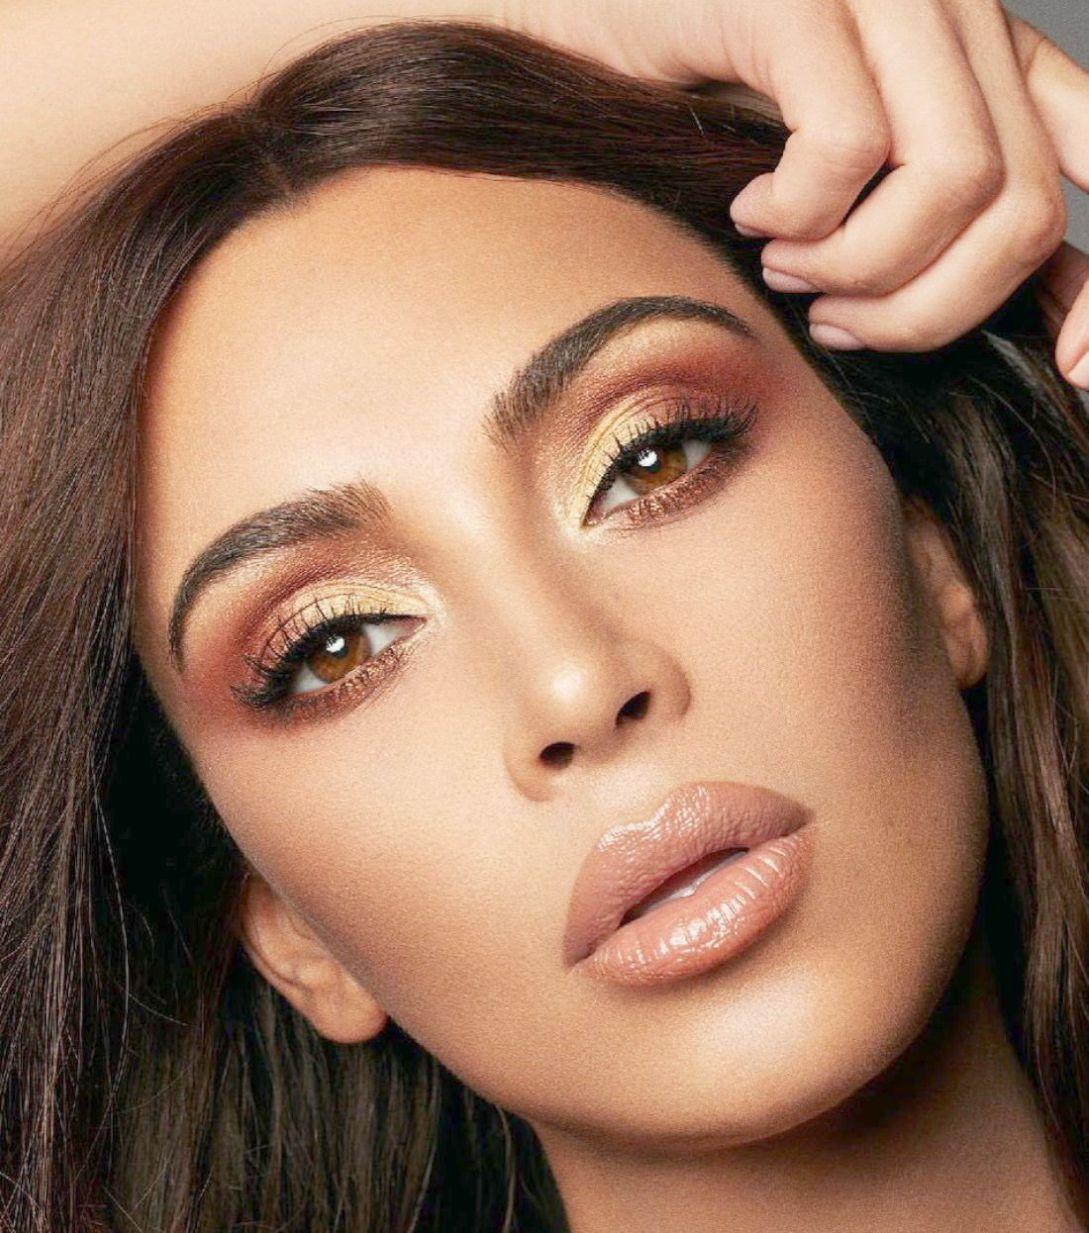 Alexandria Kayy Female Model Profile - Vancouver, British